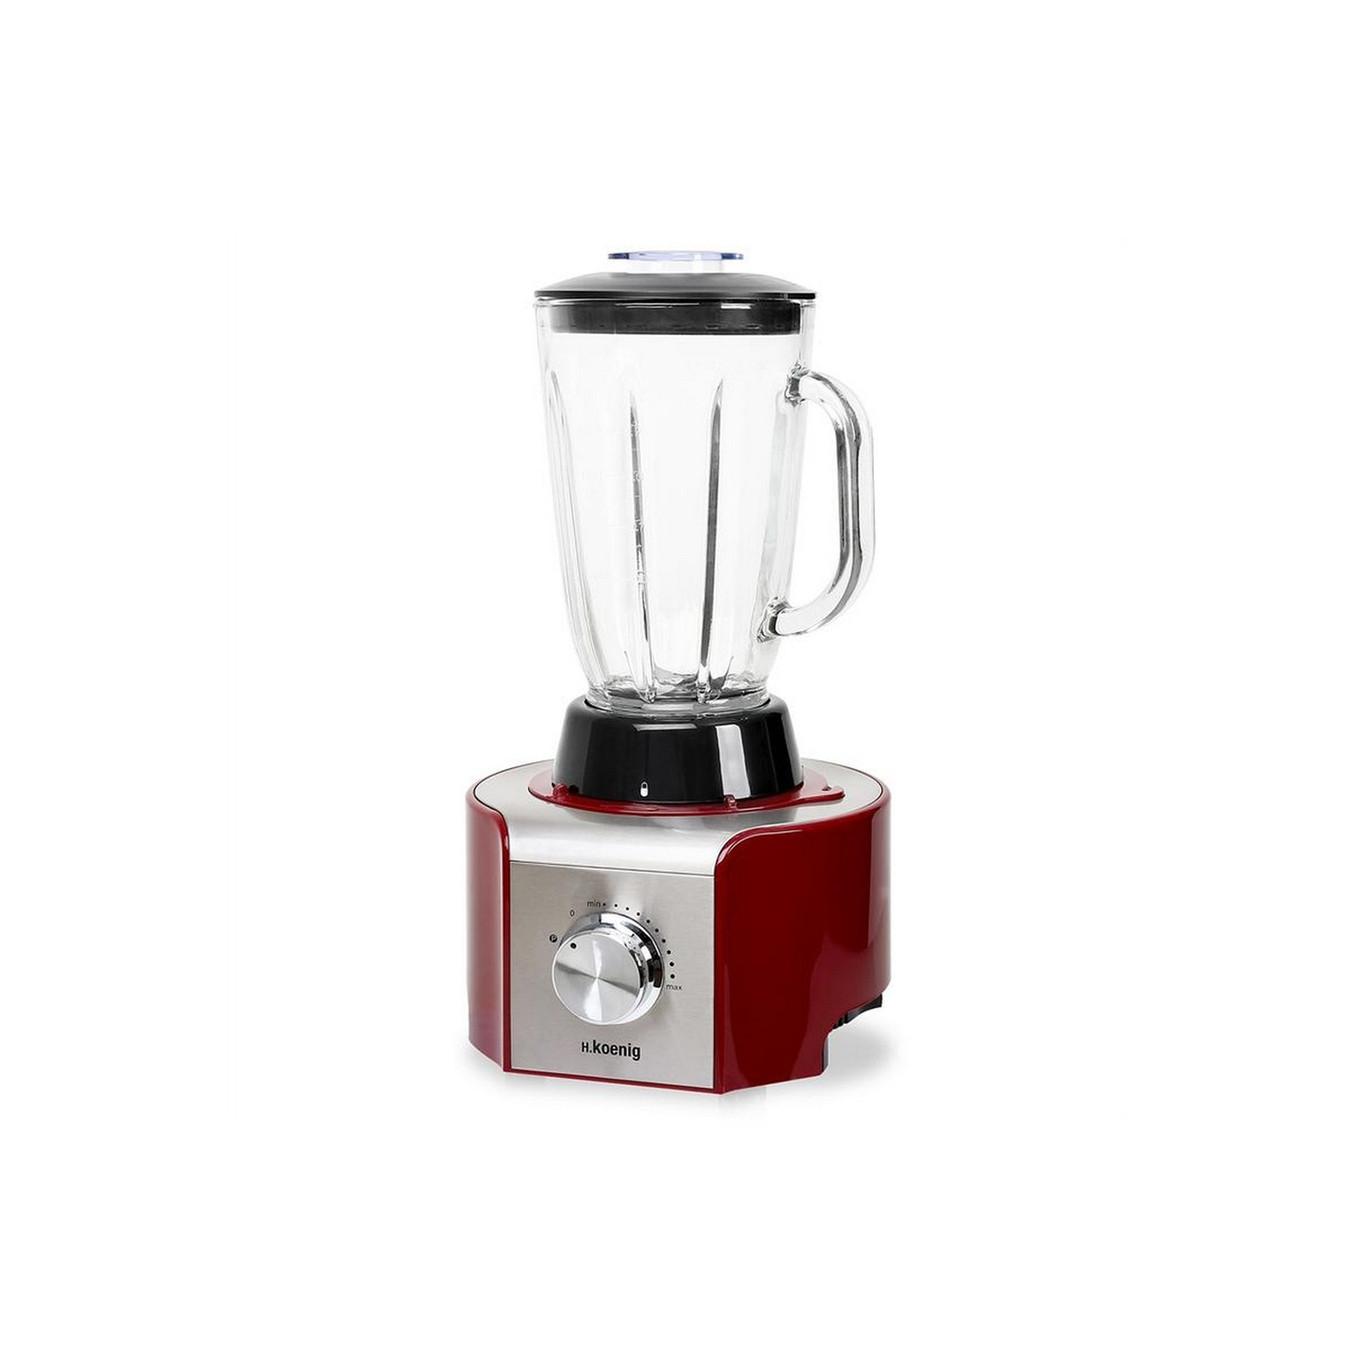 Robot multifonctions h koenig mx18xt rouge bestofrobots - Robot cuisine comparatif ...